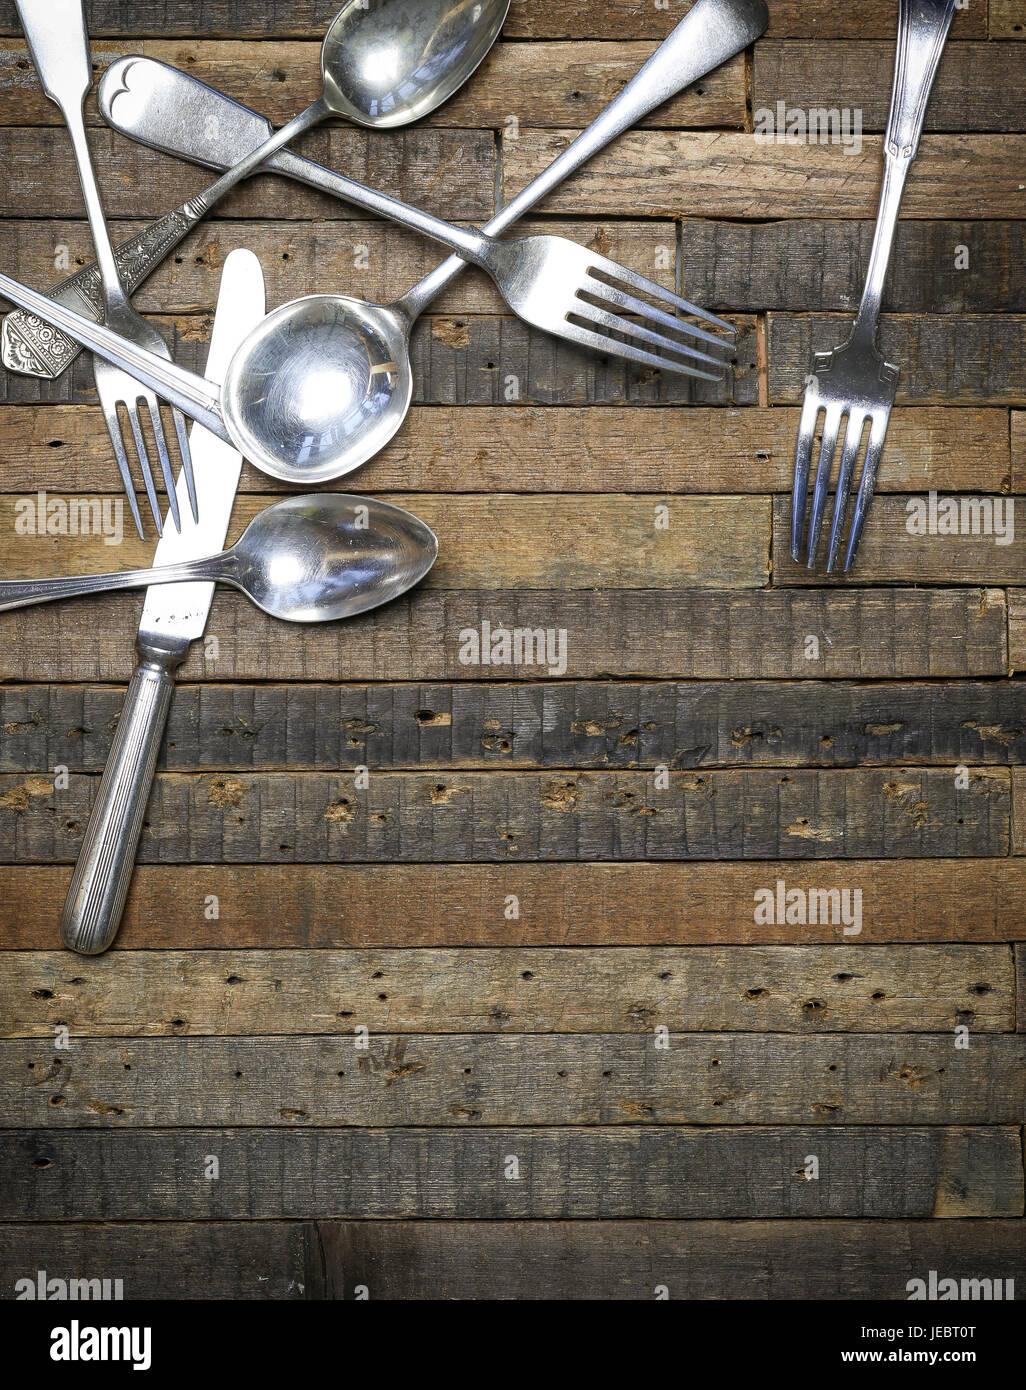 Vintage antique spoons forks and knifes on old wooden background flat lay food blog instagram mockup - Stock Image